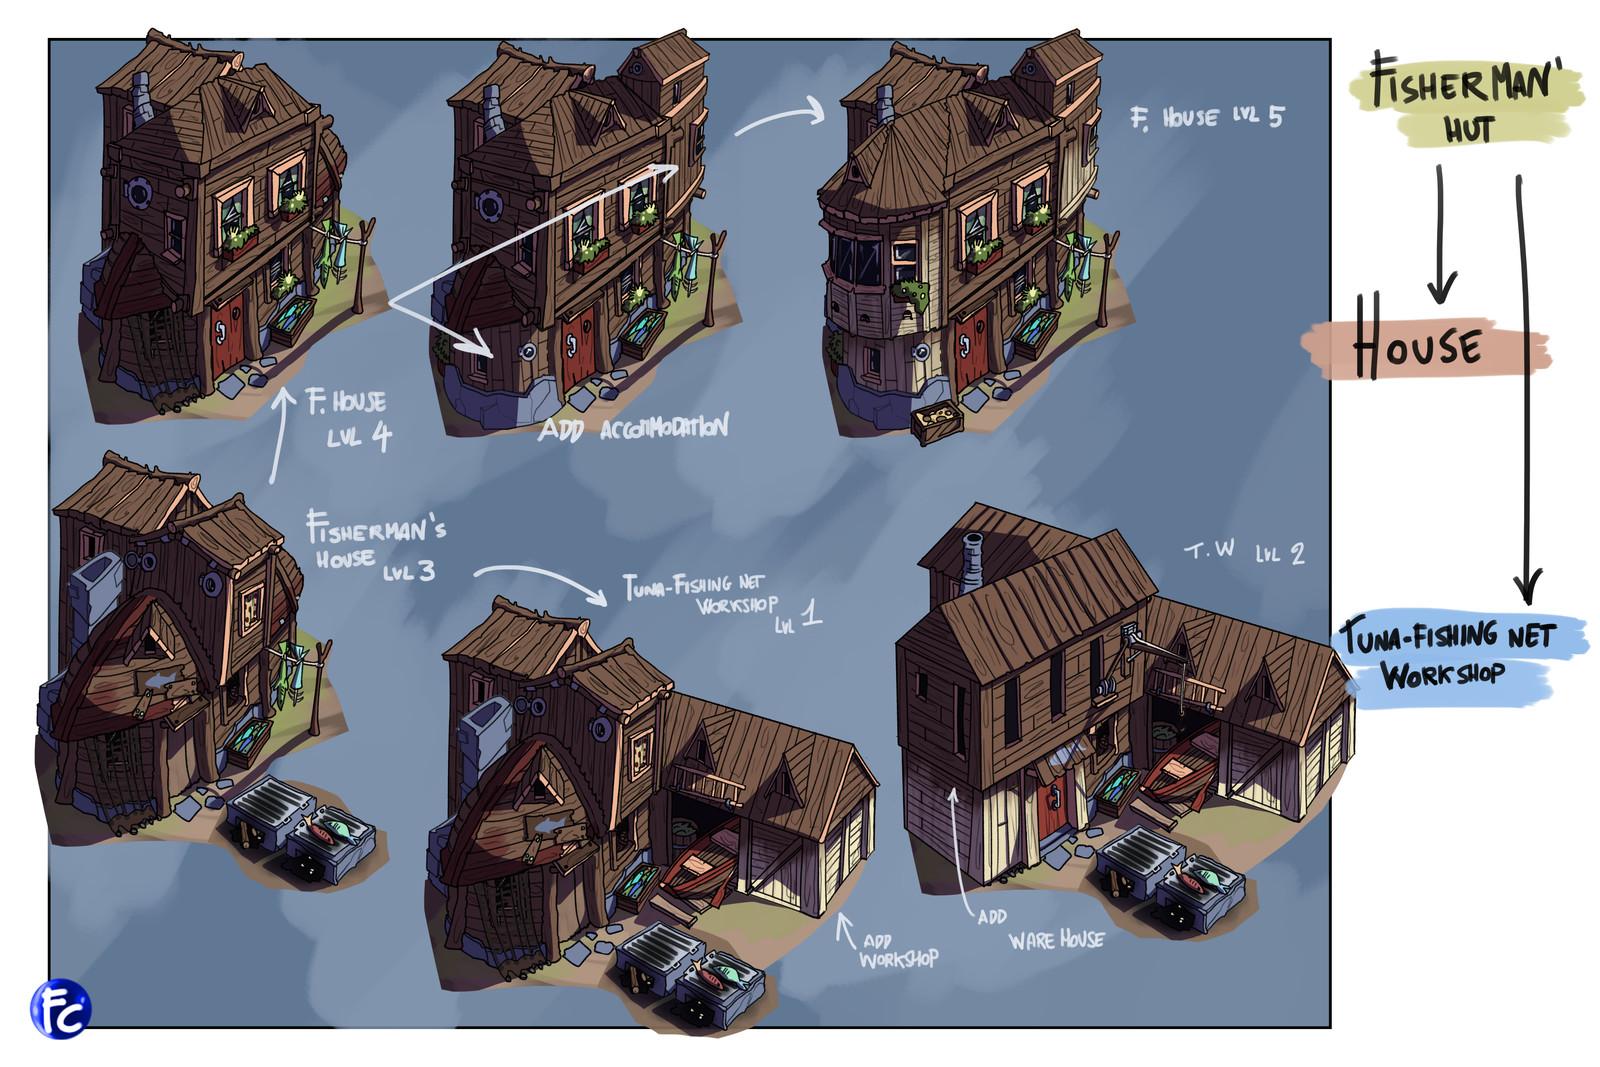 fisherman house specialization